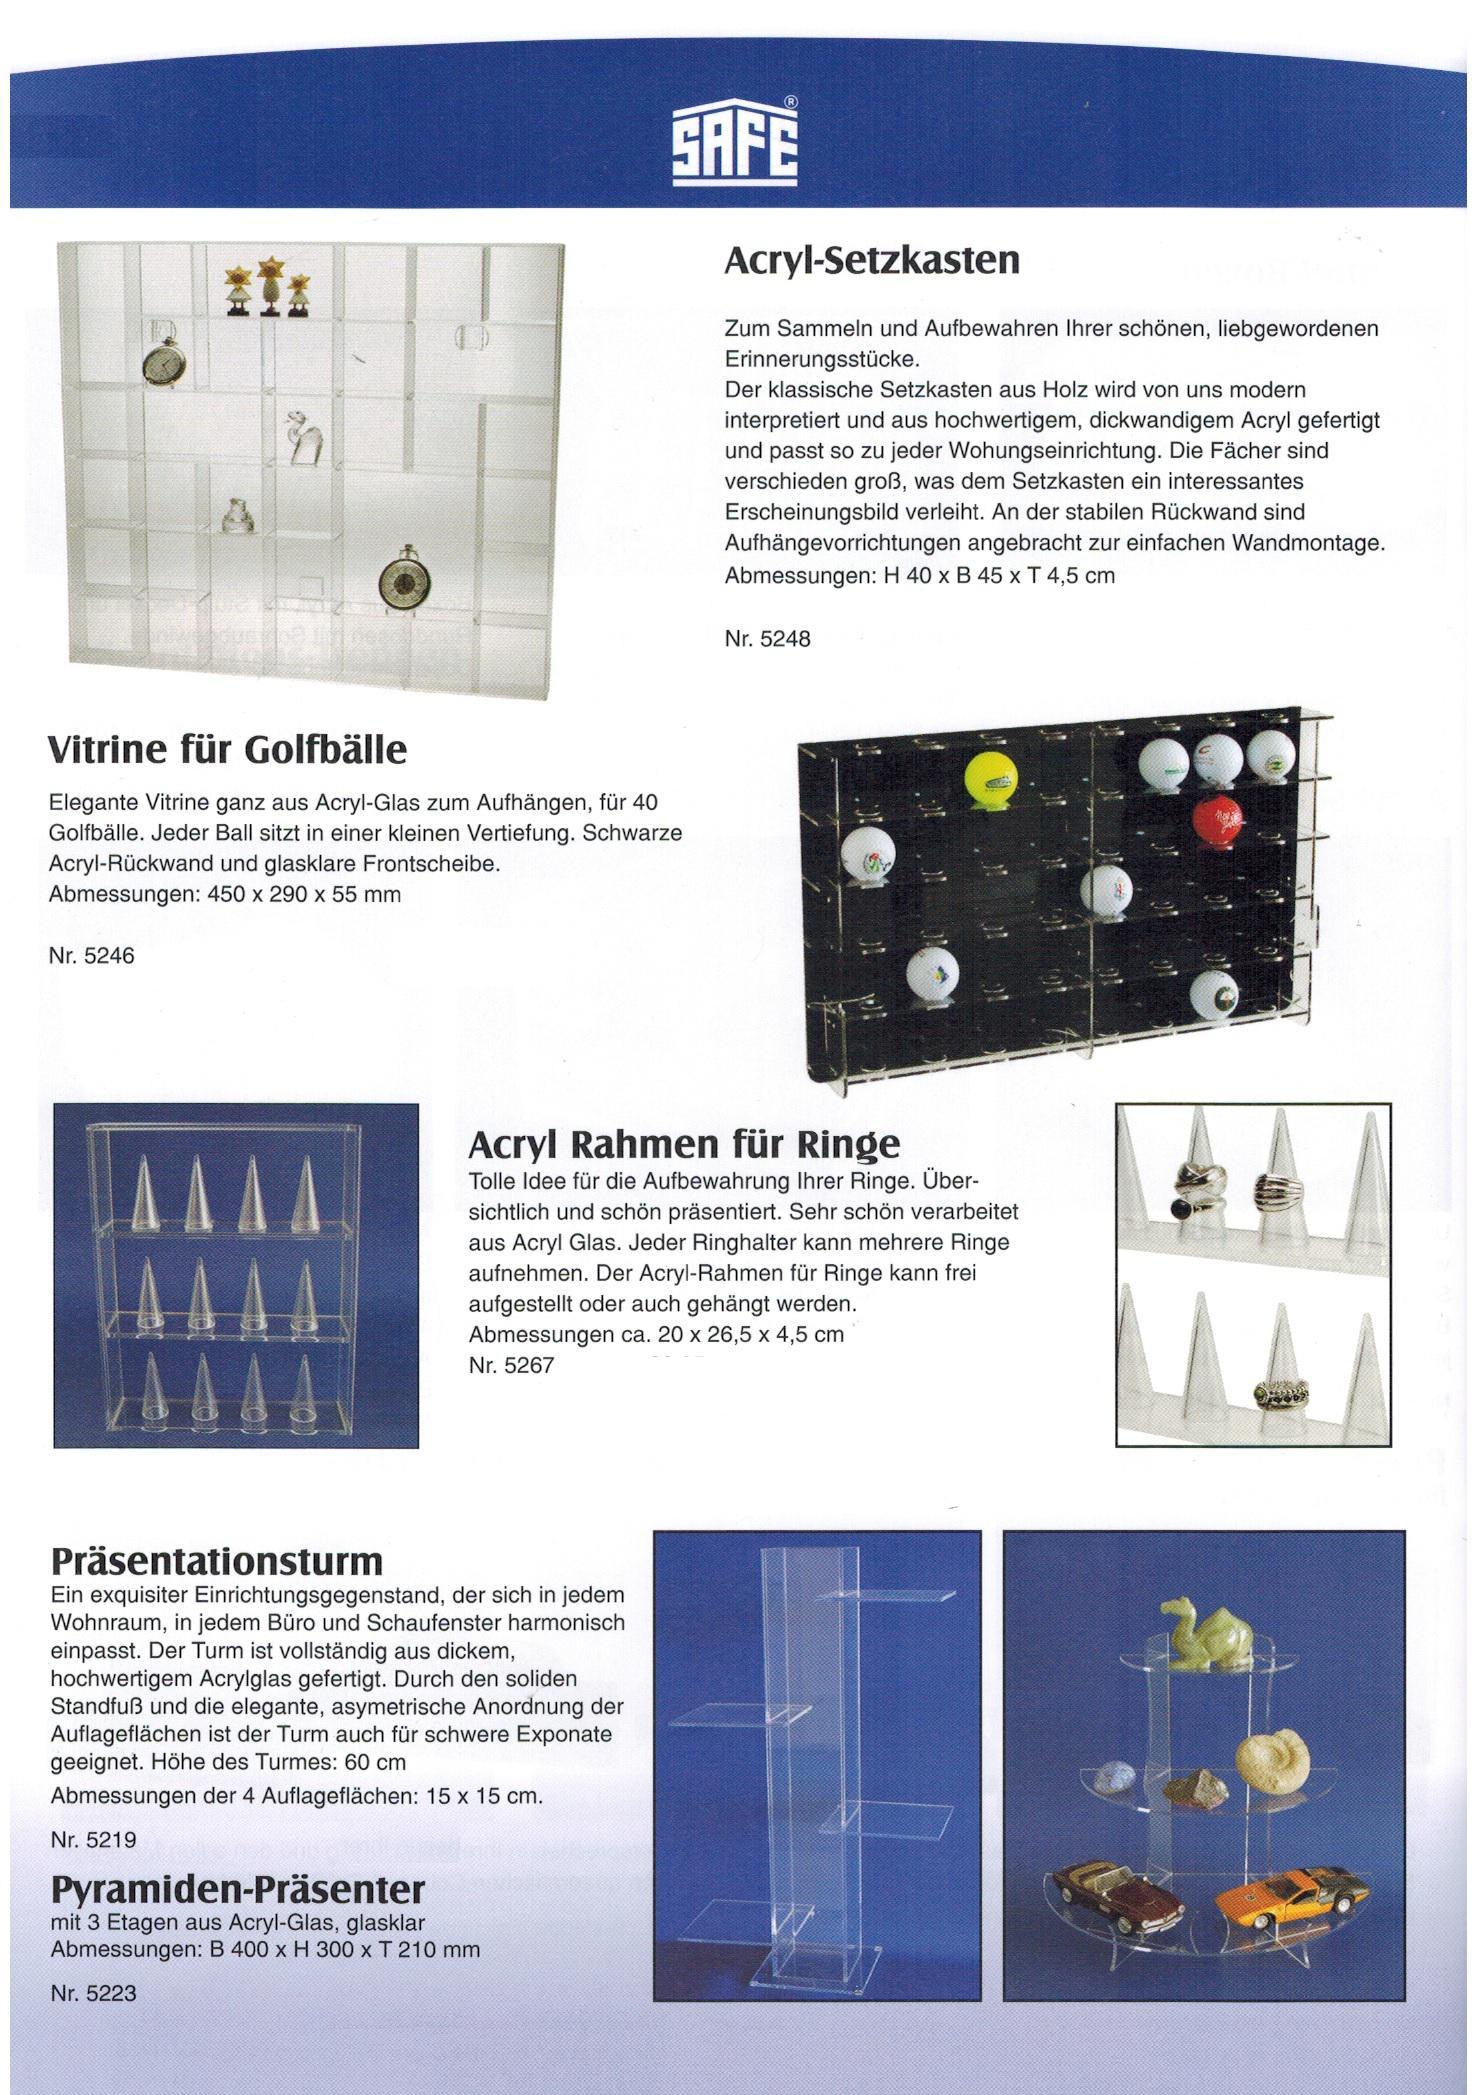 60 cm hhe fabulous gallery of xavax teetassen aus glas. Black Bedroom Furniture Sets. Home Design Ideas